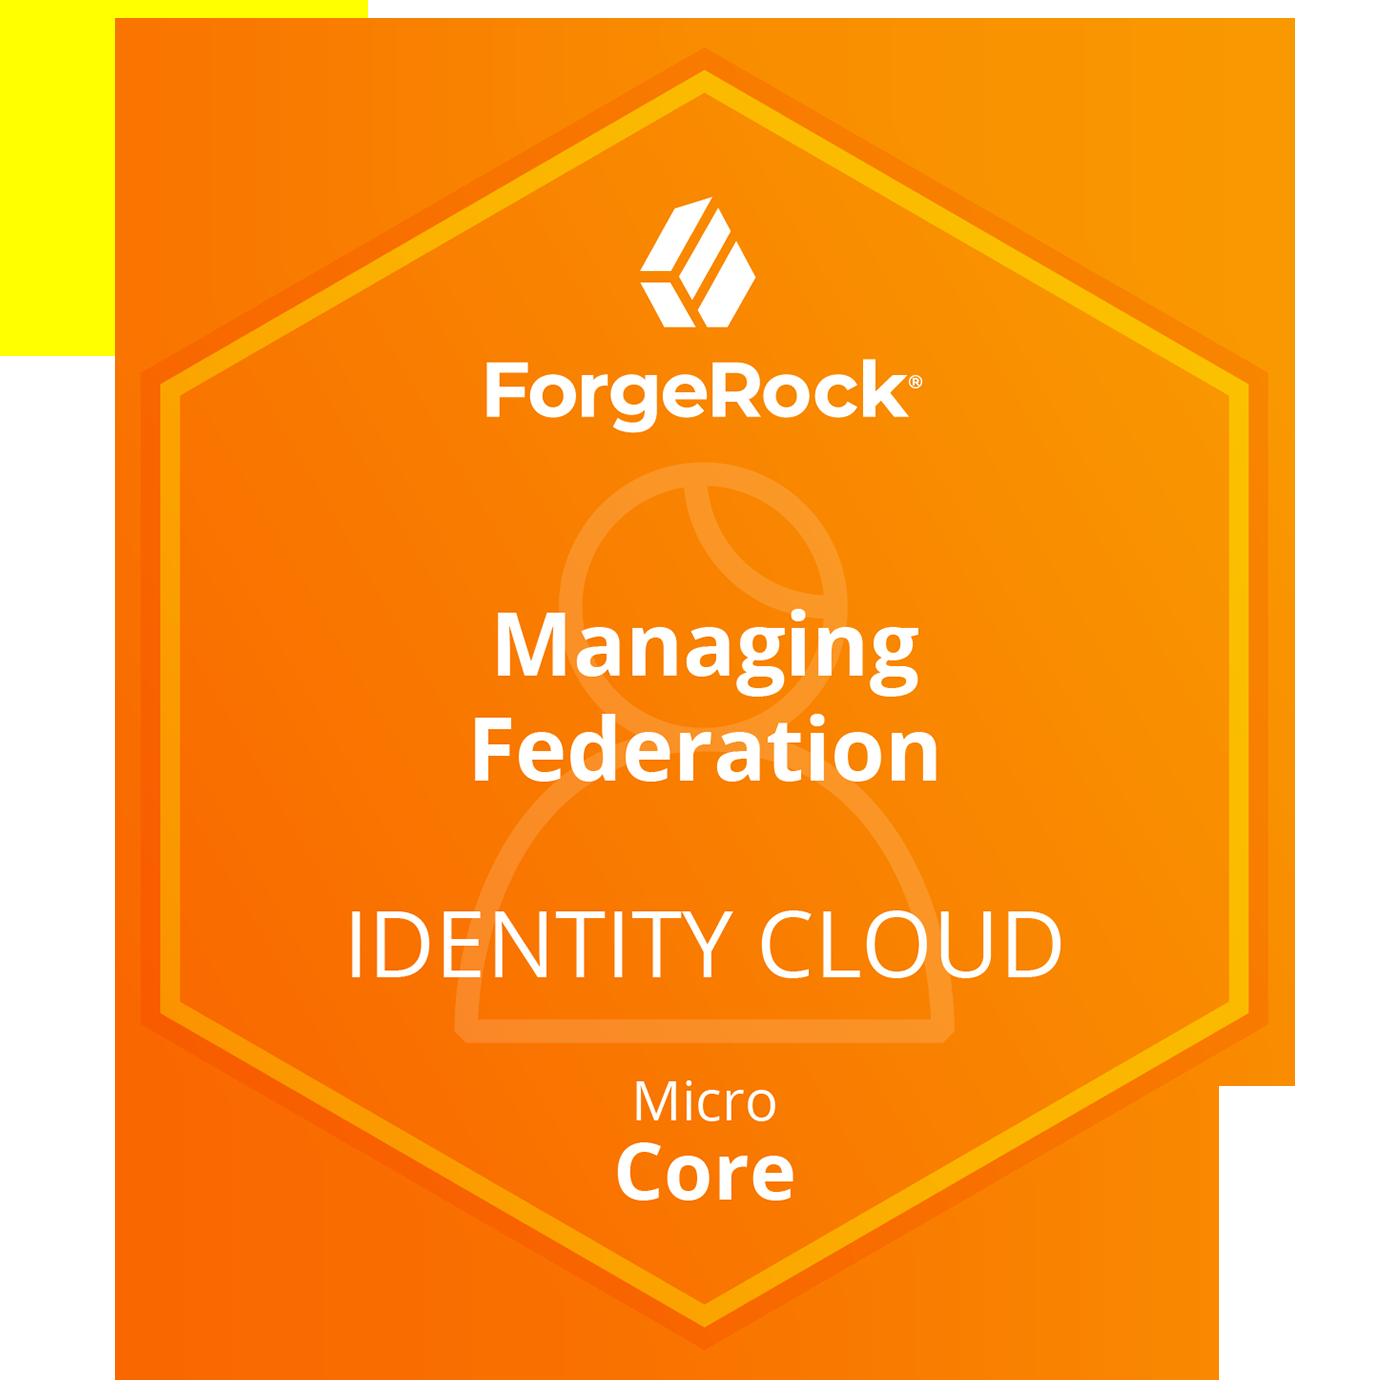 ForgeRock Identity Cloud Micro Core Skills - Managing Federation